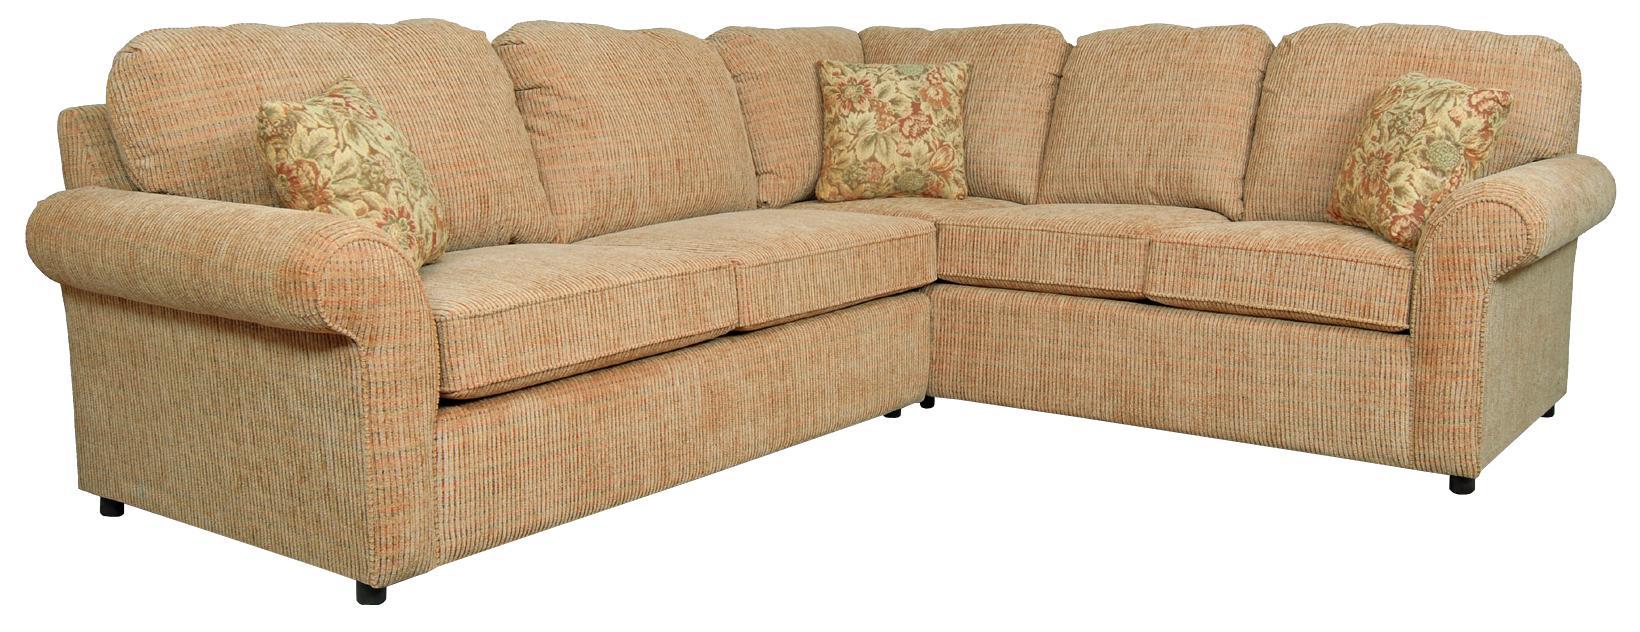 England Malibu 4 5 Seat Corner Sectional Sofa Dunk